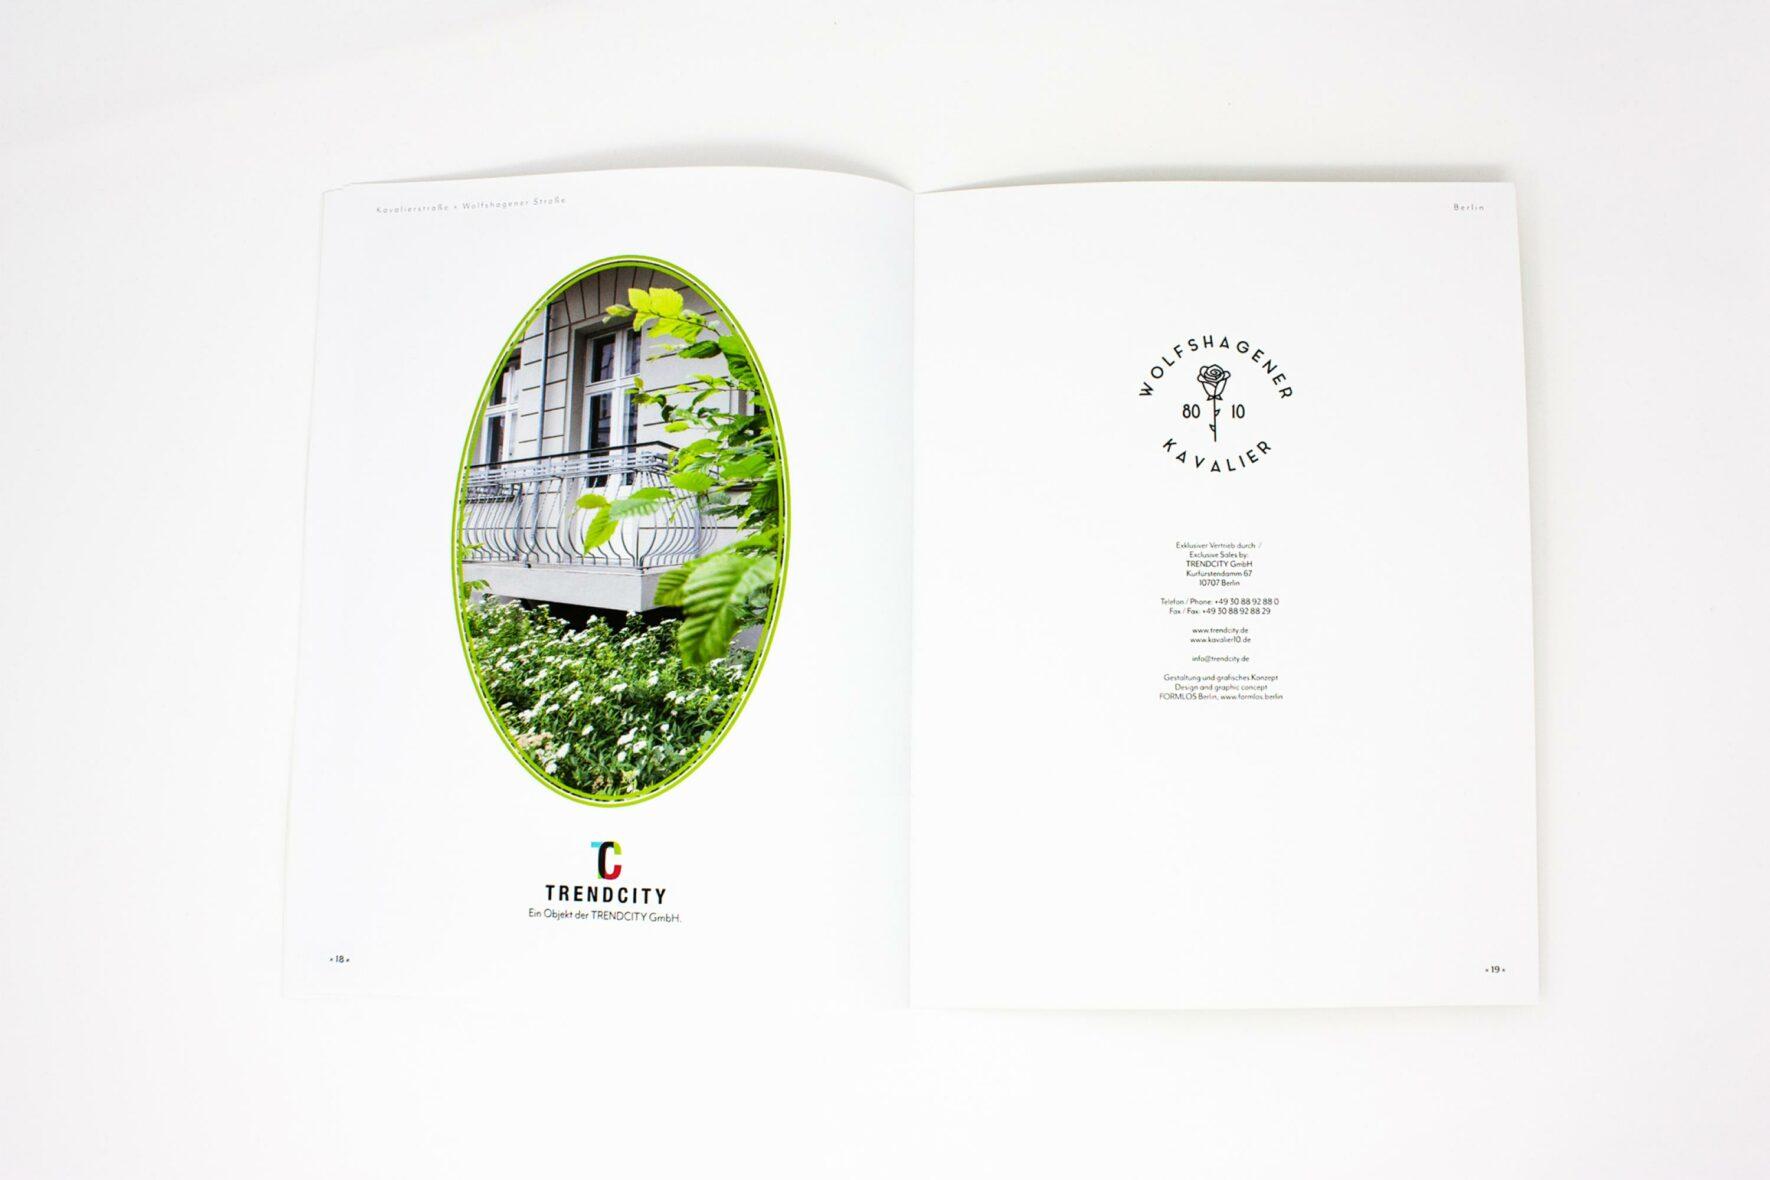 FORMLOS-Trendcity-Immobilien-Corporate-Design-Layout-Broschüre-15